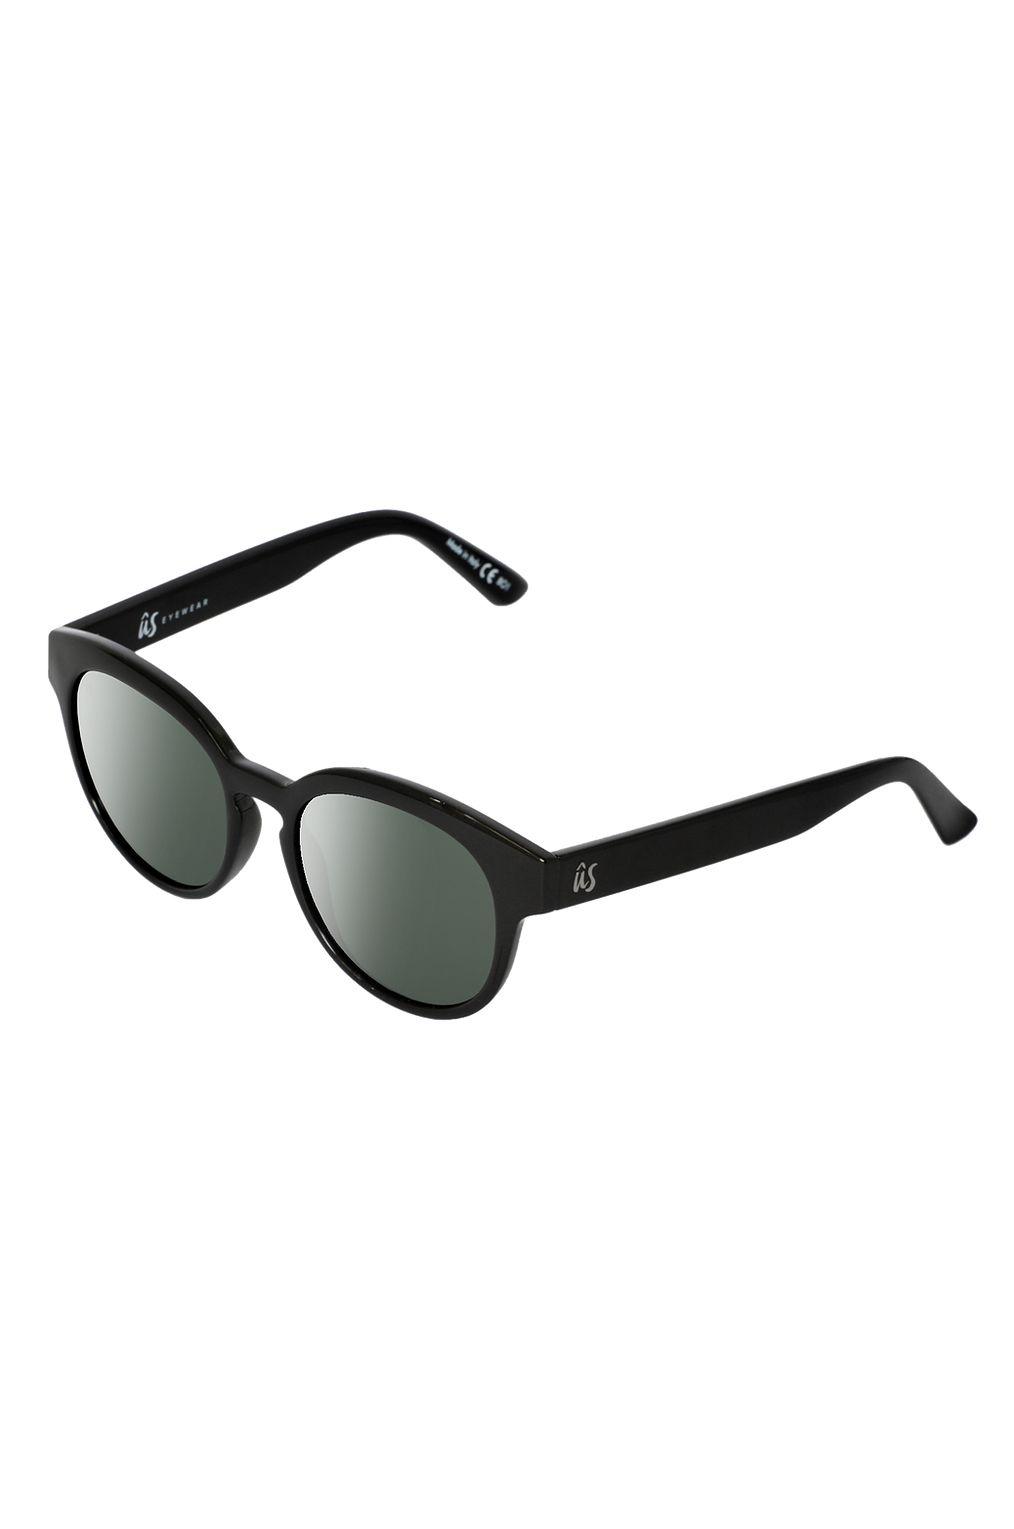 US Sunglasses NATHI Gloss Black/Vintage Grey